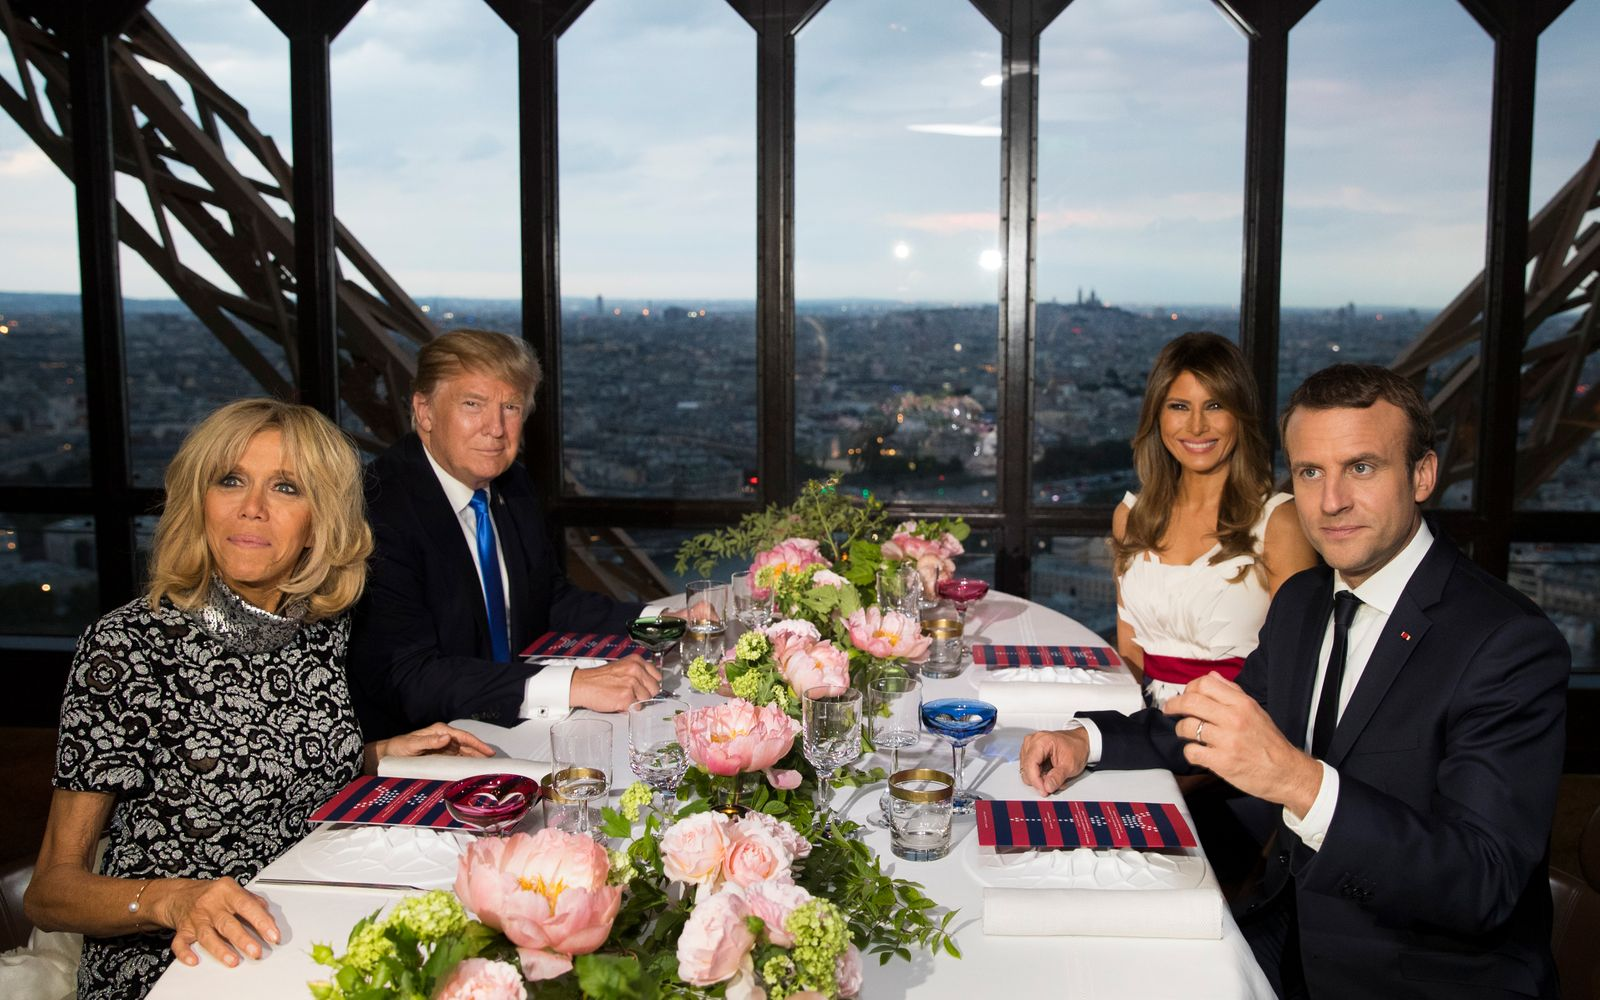 Donald Trump,Melania Trump,Emmanuel Macron,Brigitte Macron